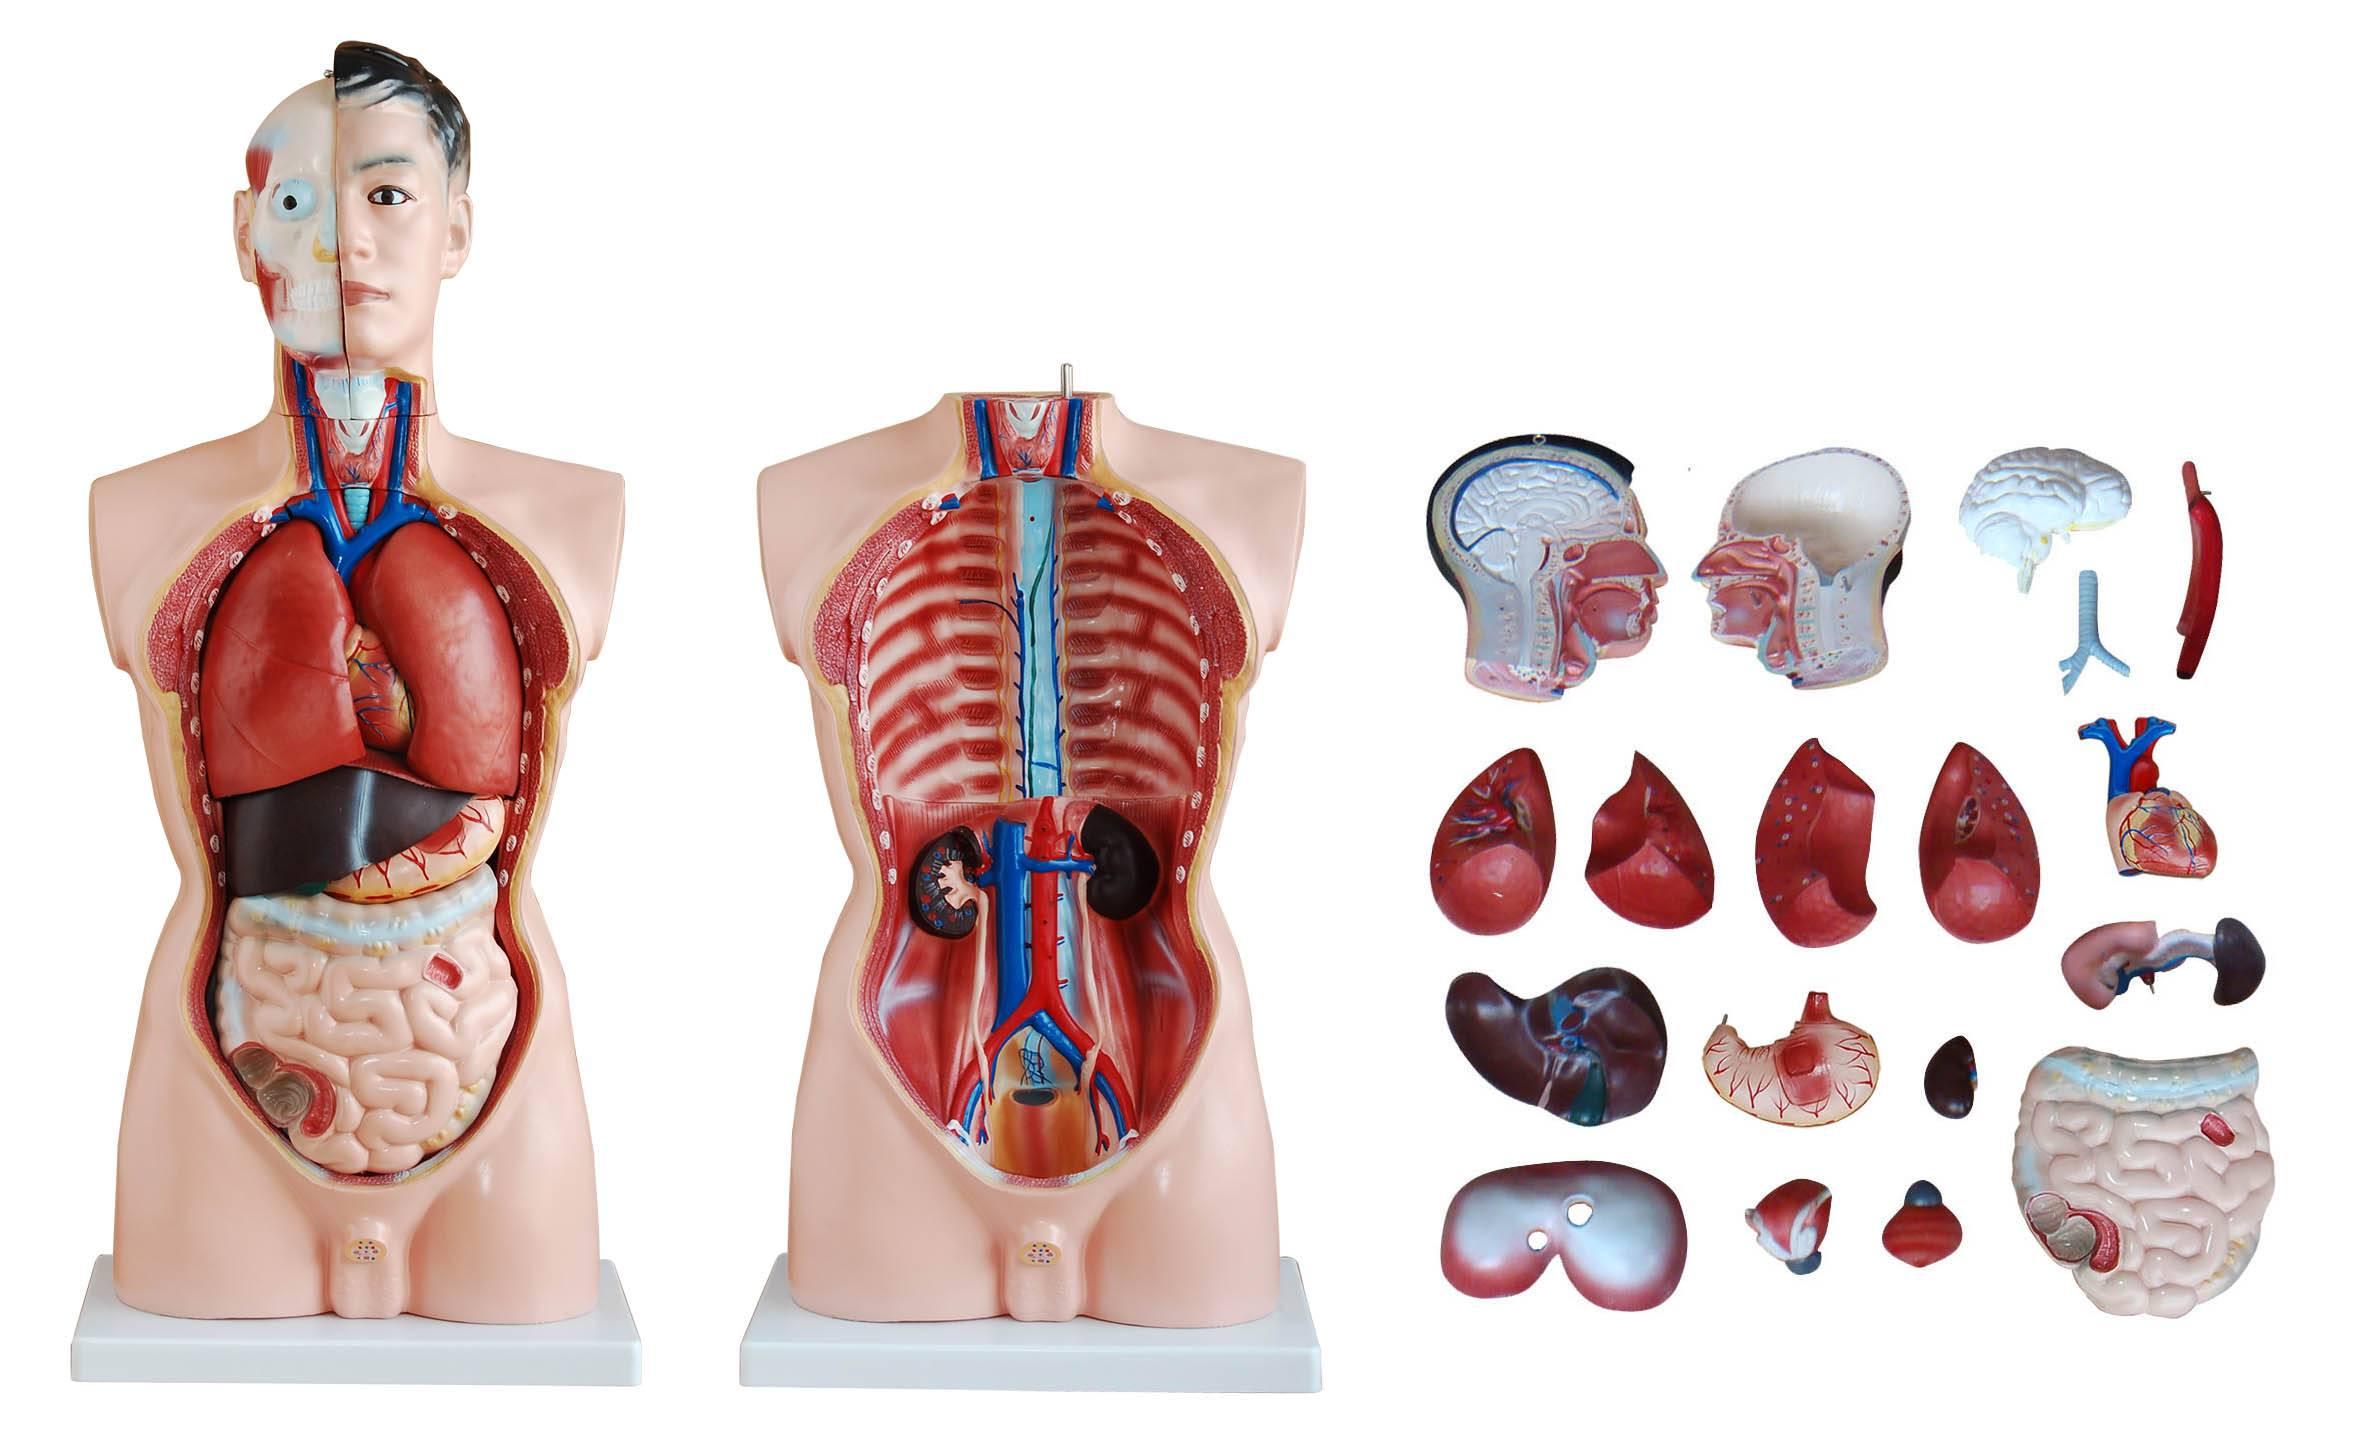 85cm Human Anatomy Male Torso 19 Parts